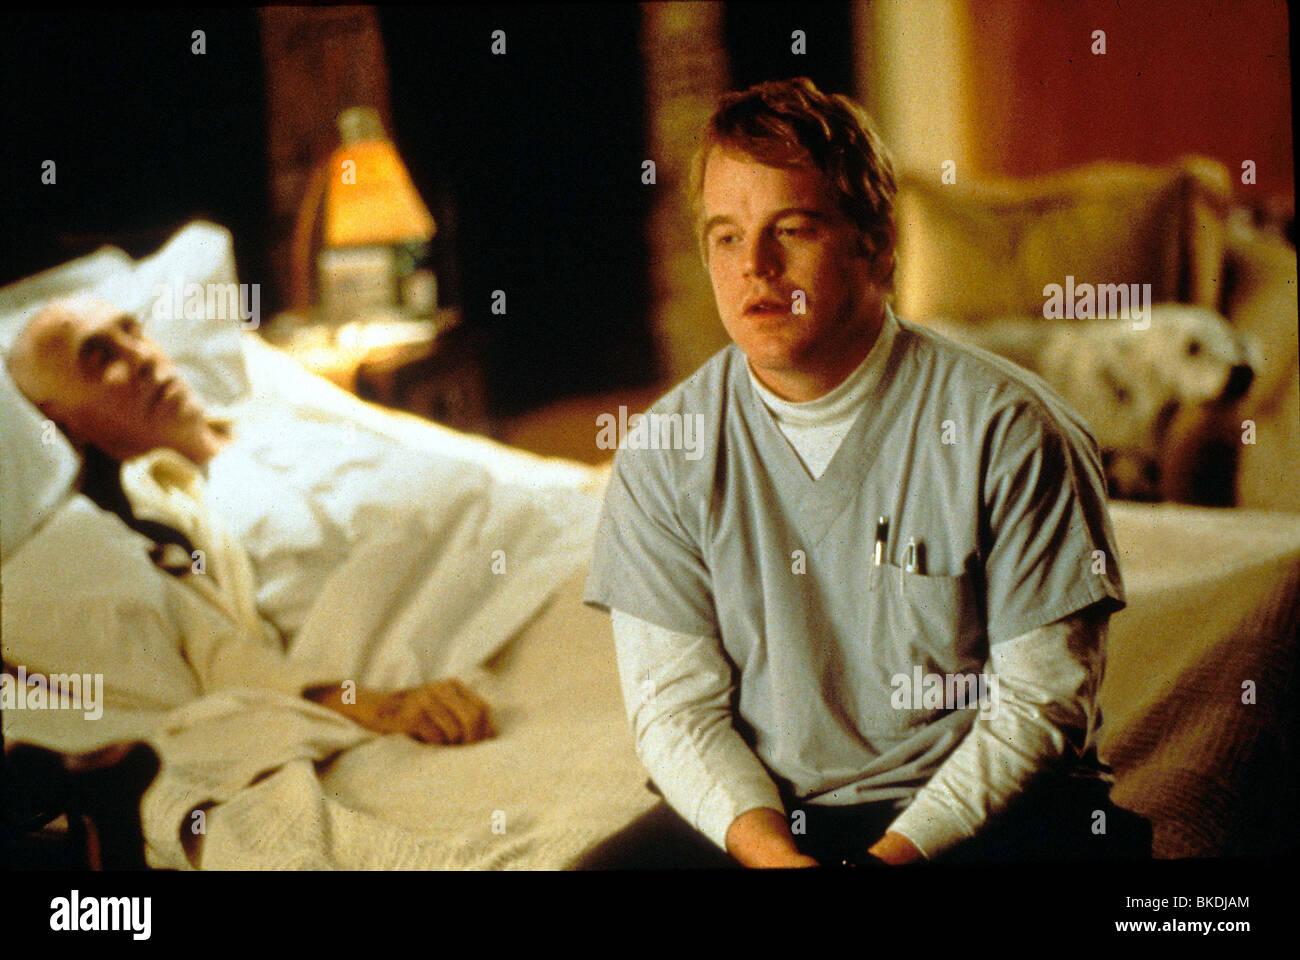 MAGNOLIA (2000) JASON ROBARDS, PHILLIP SEYMOUR HOFFMAN OLIA 130 - Stock Image